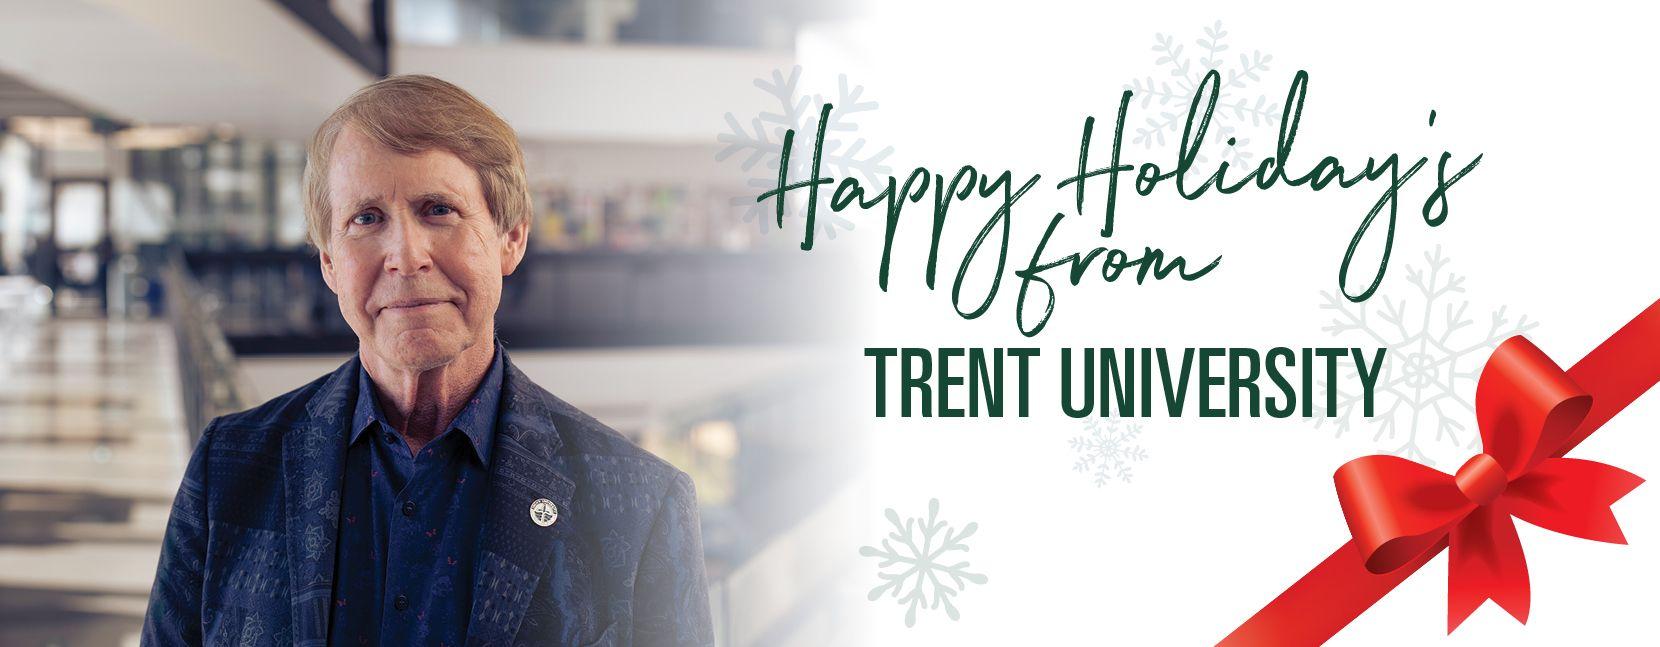 Happy Holidays from Trent University